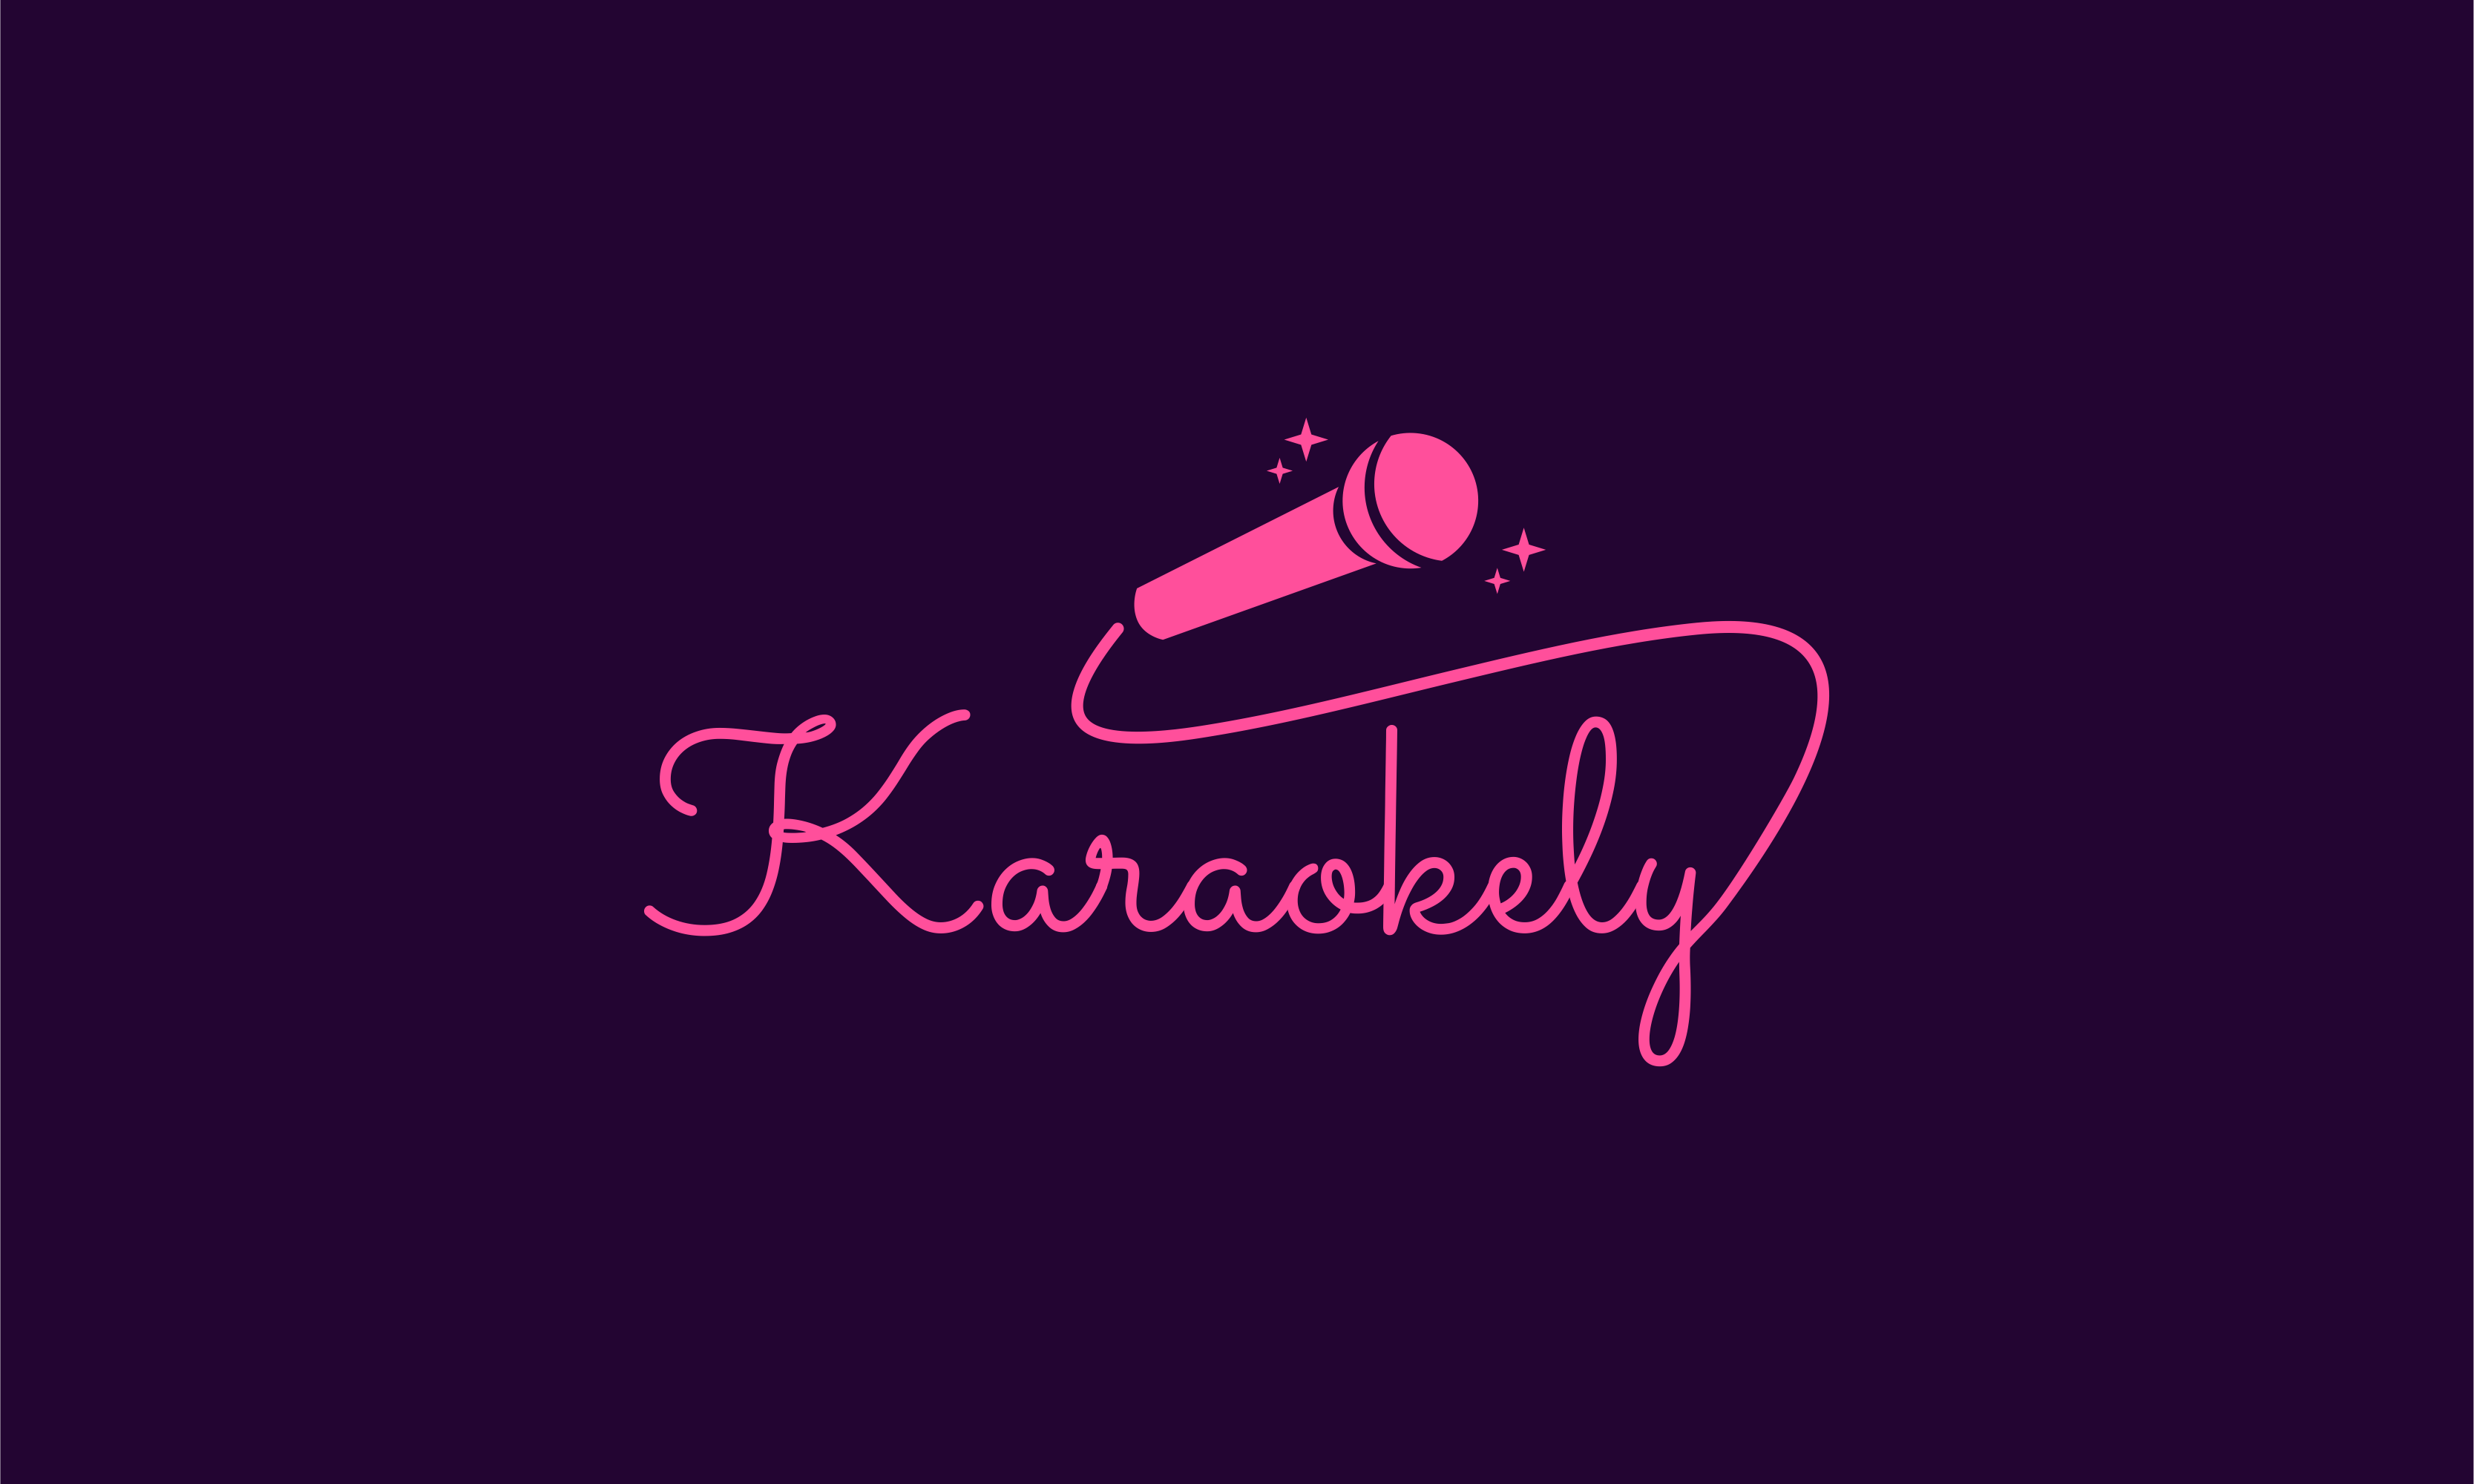 Karaokely